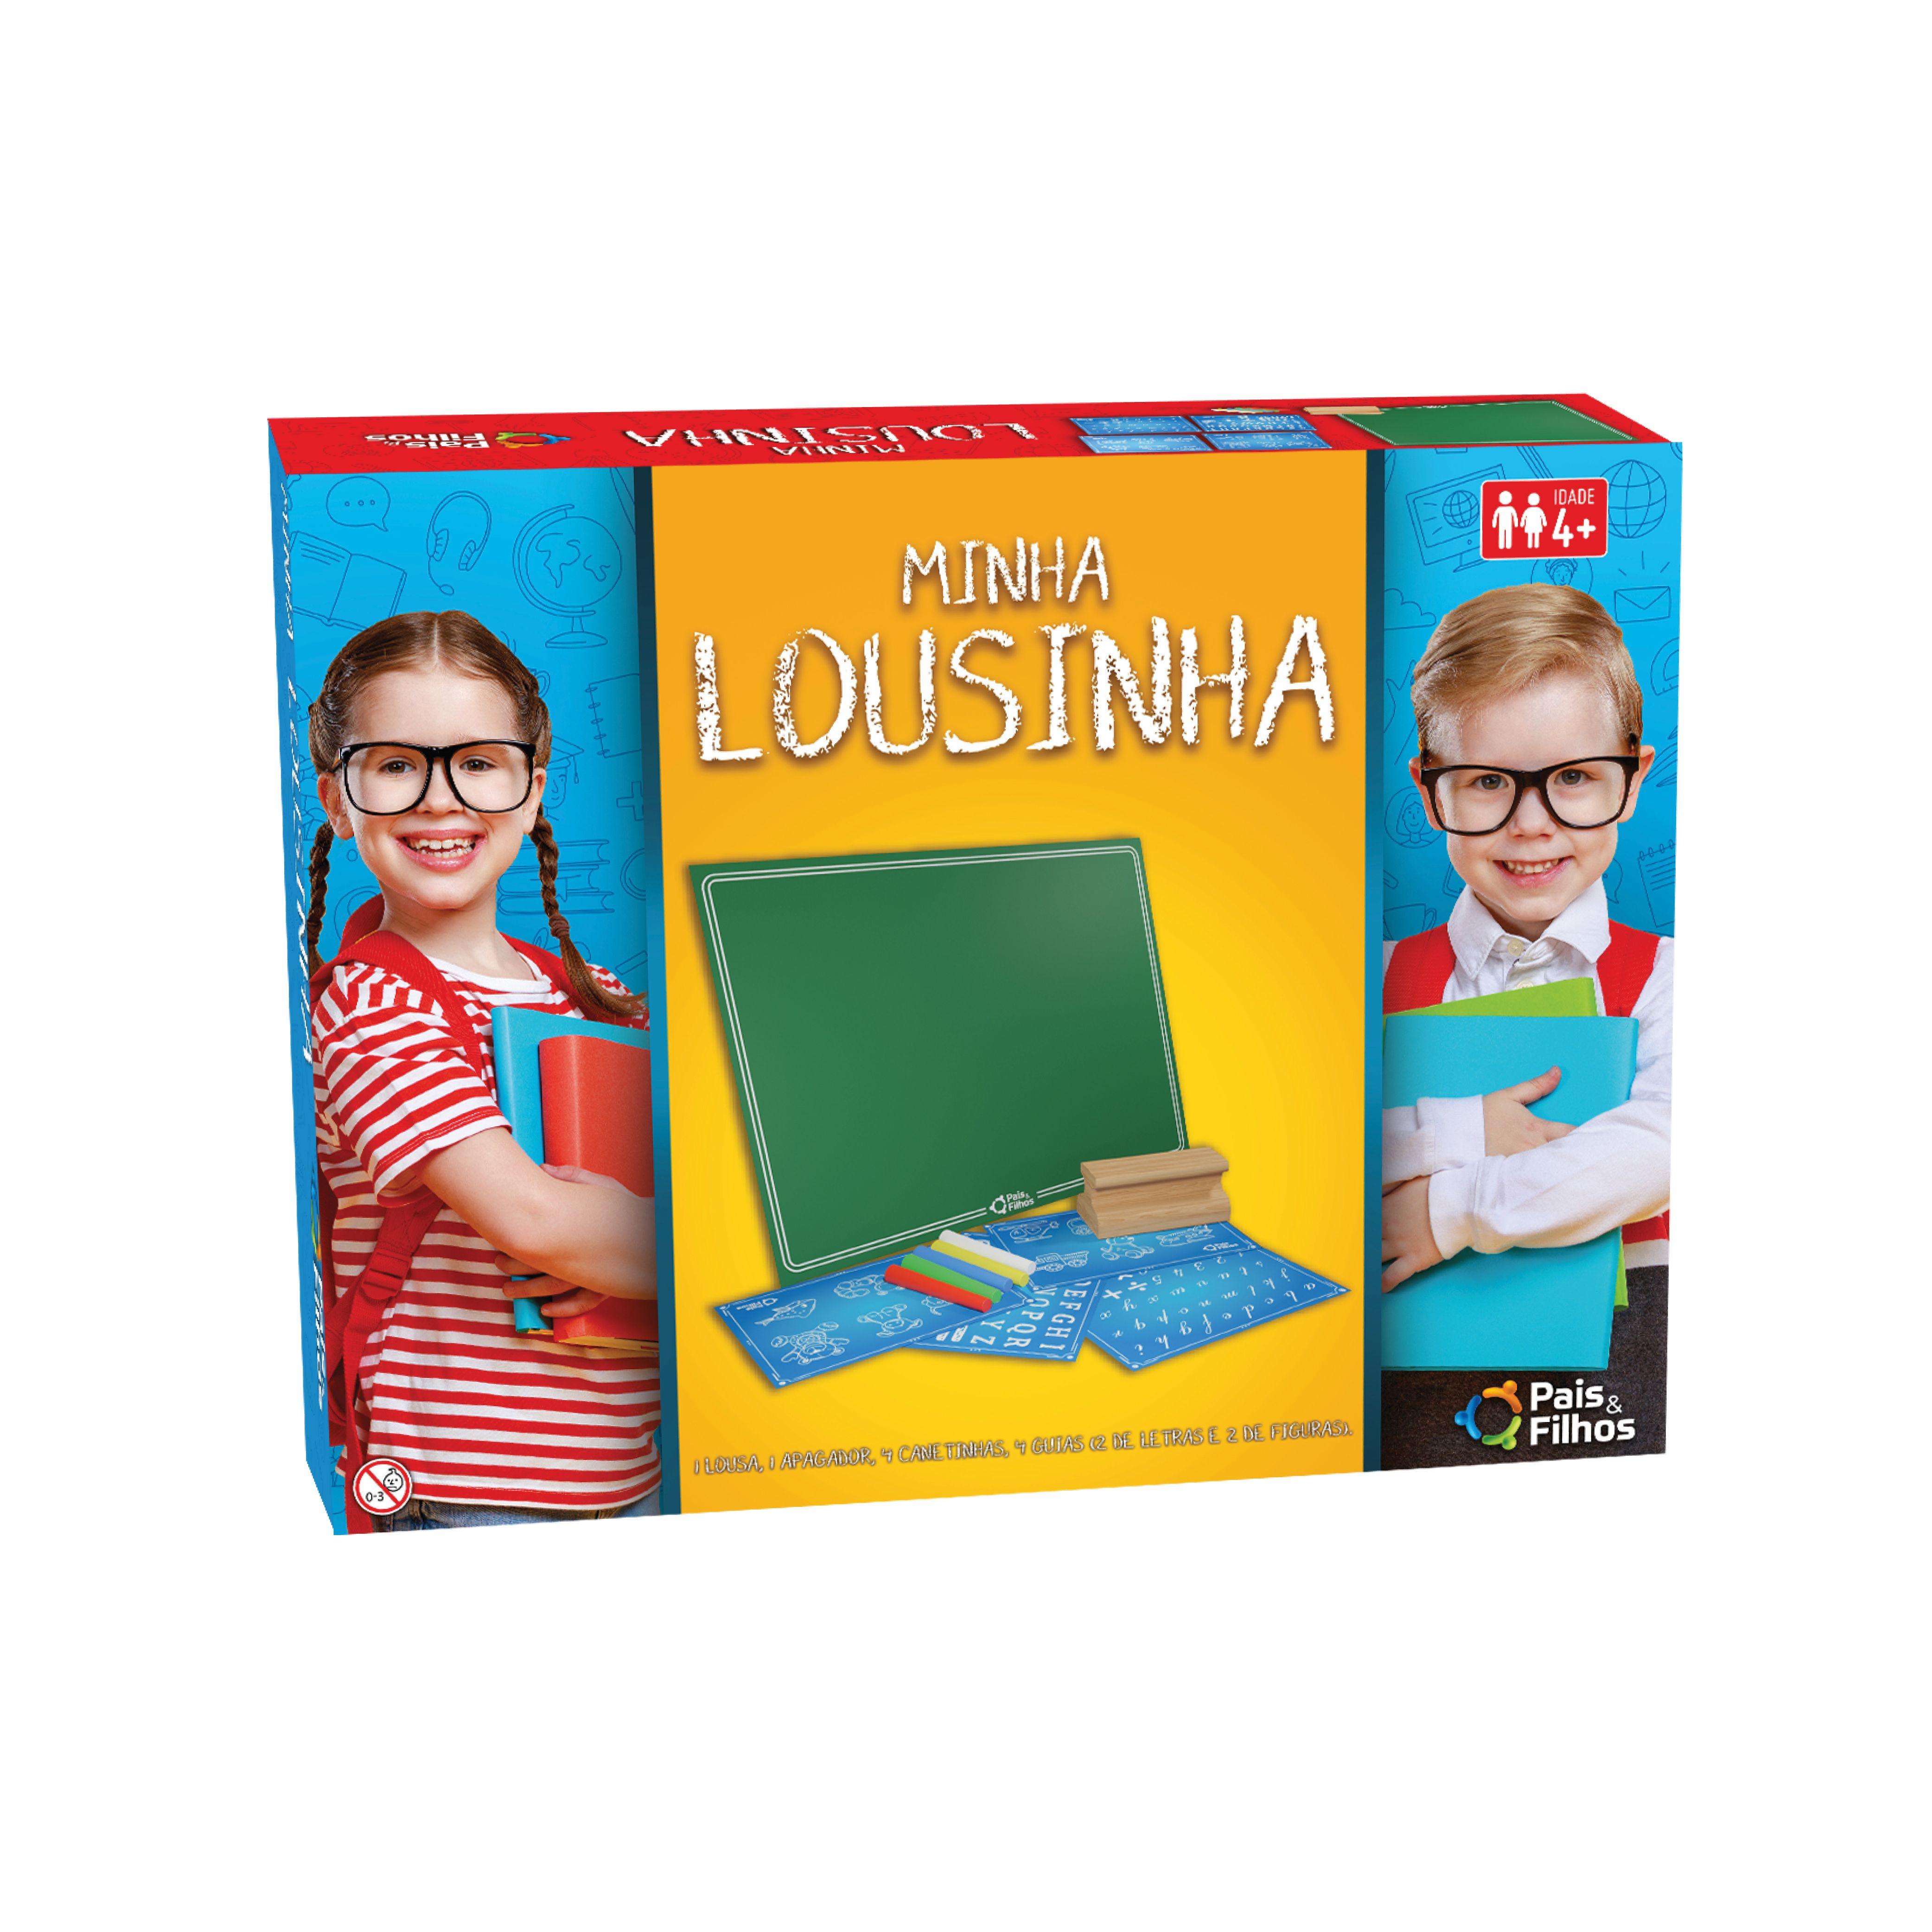 Minha Lousinha-10793